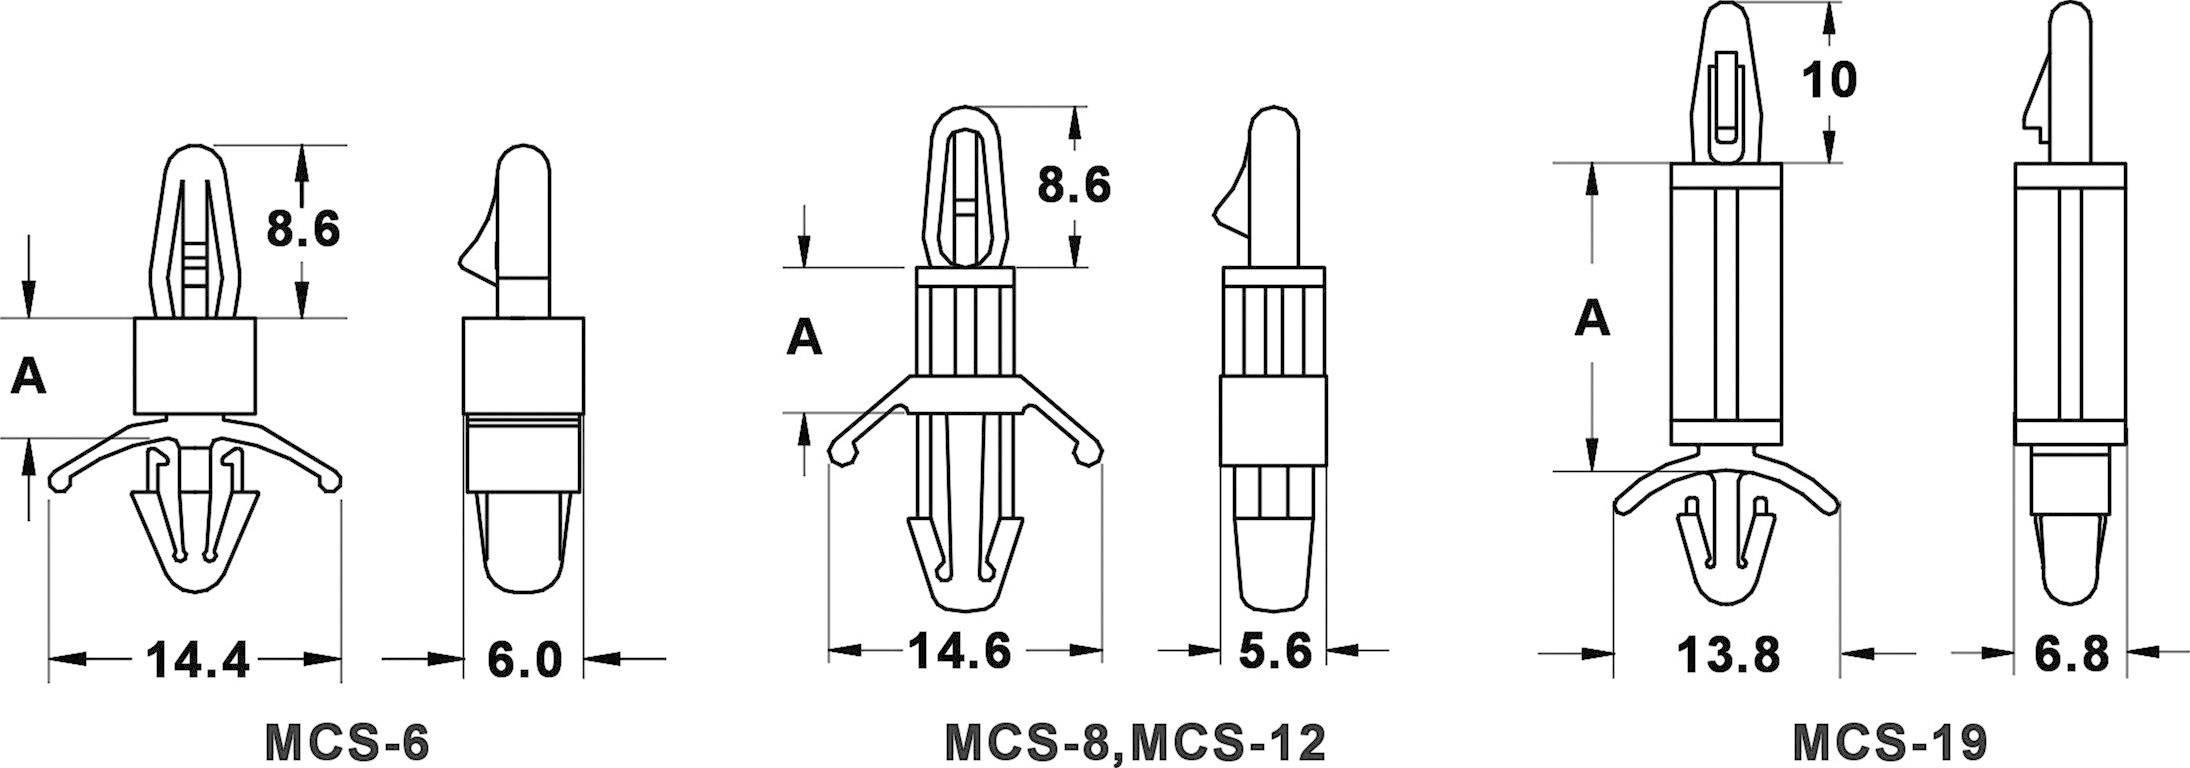 Držiak na DPS KSS MCS6 534186, polyamid, délka 6 mm, 1 ks